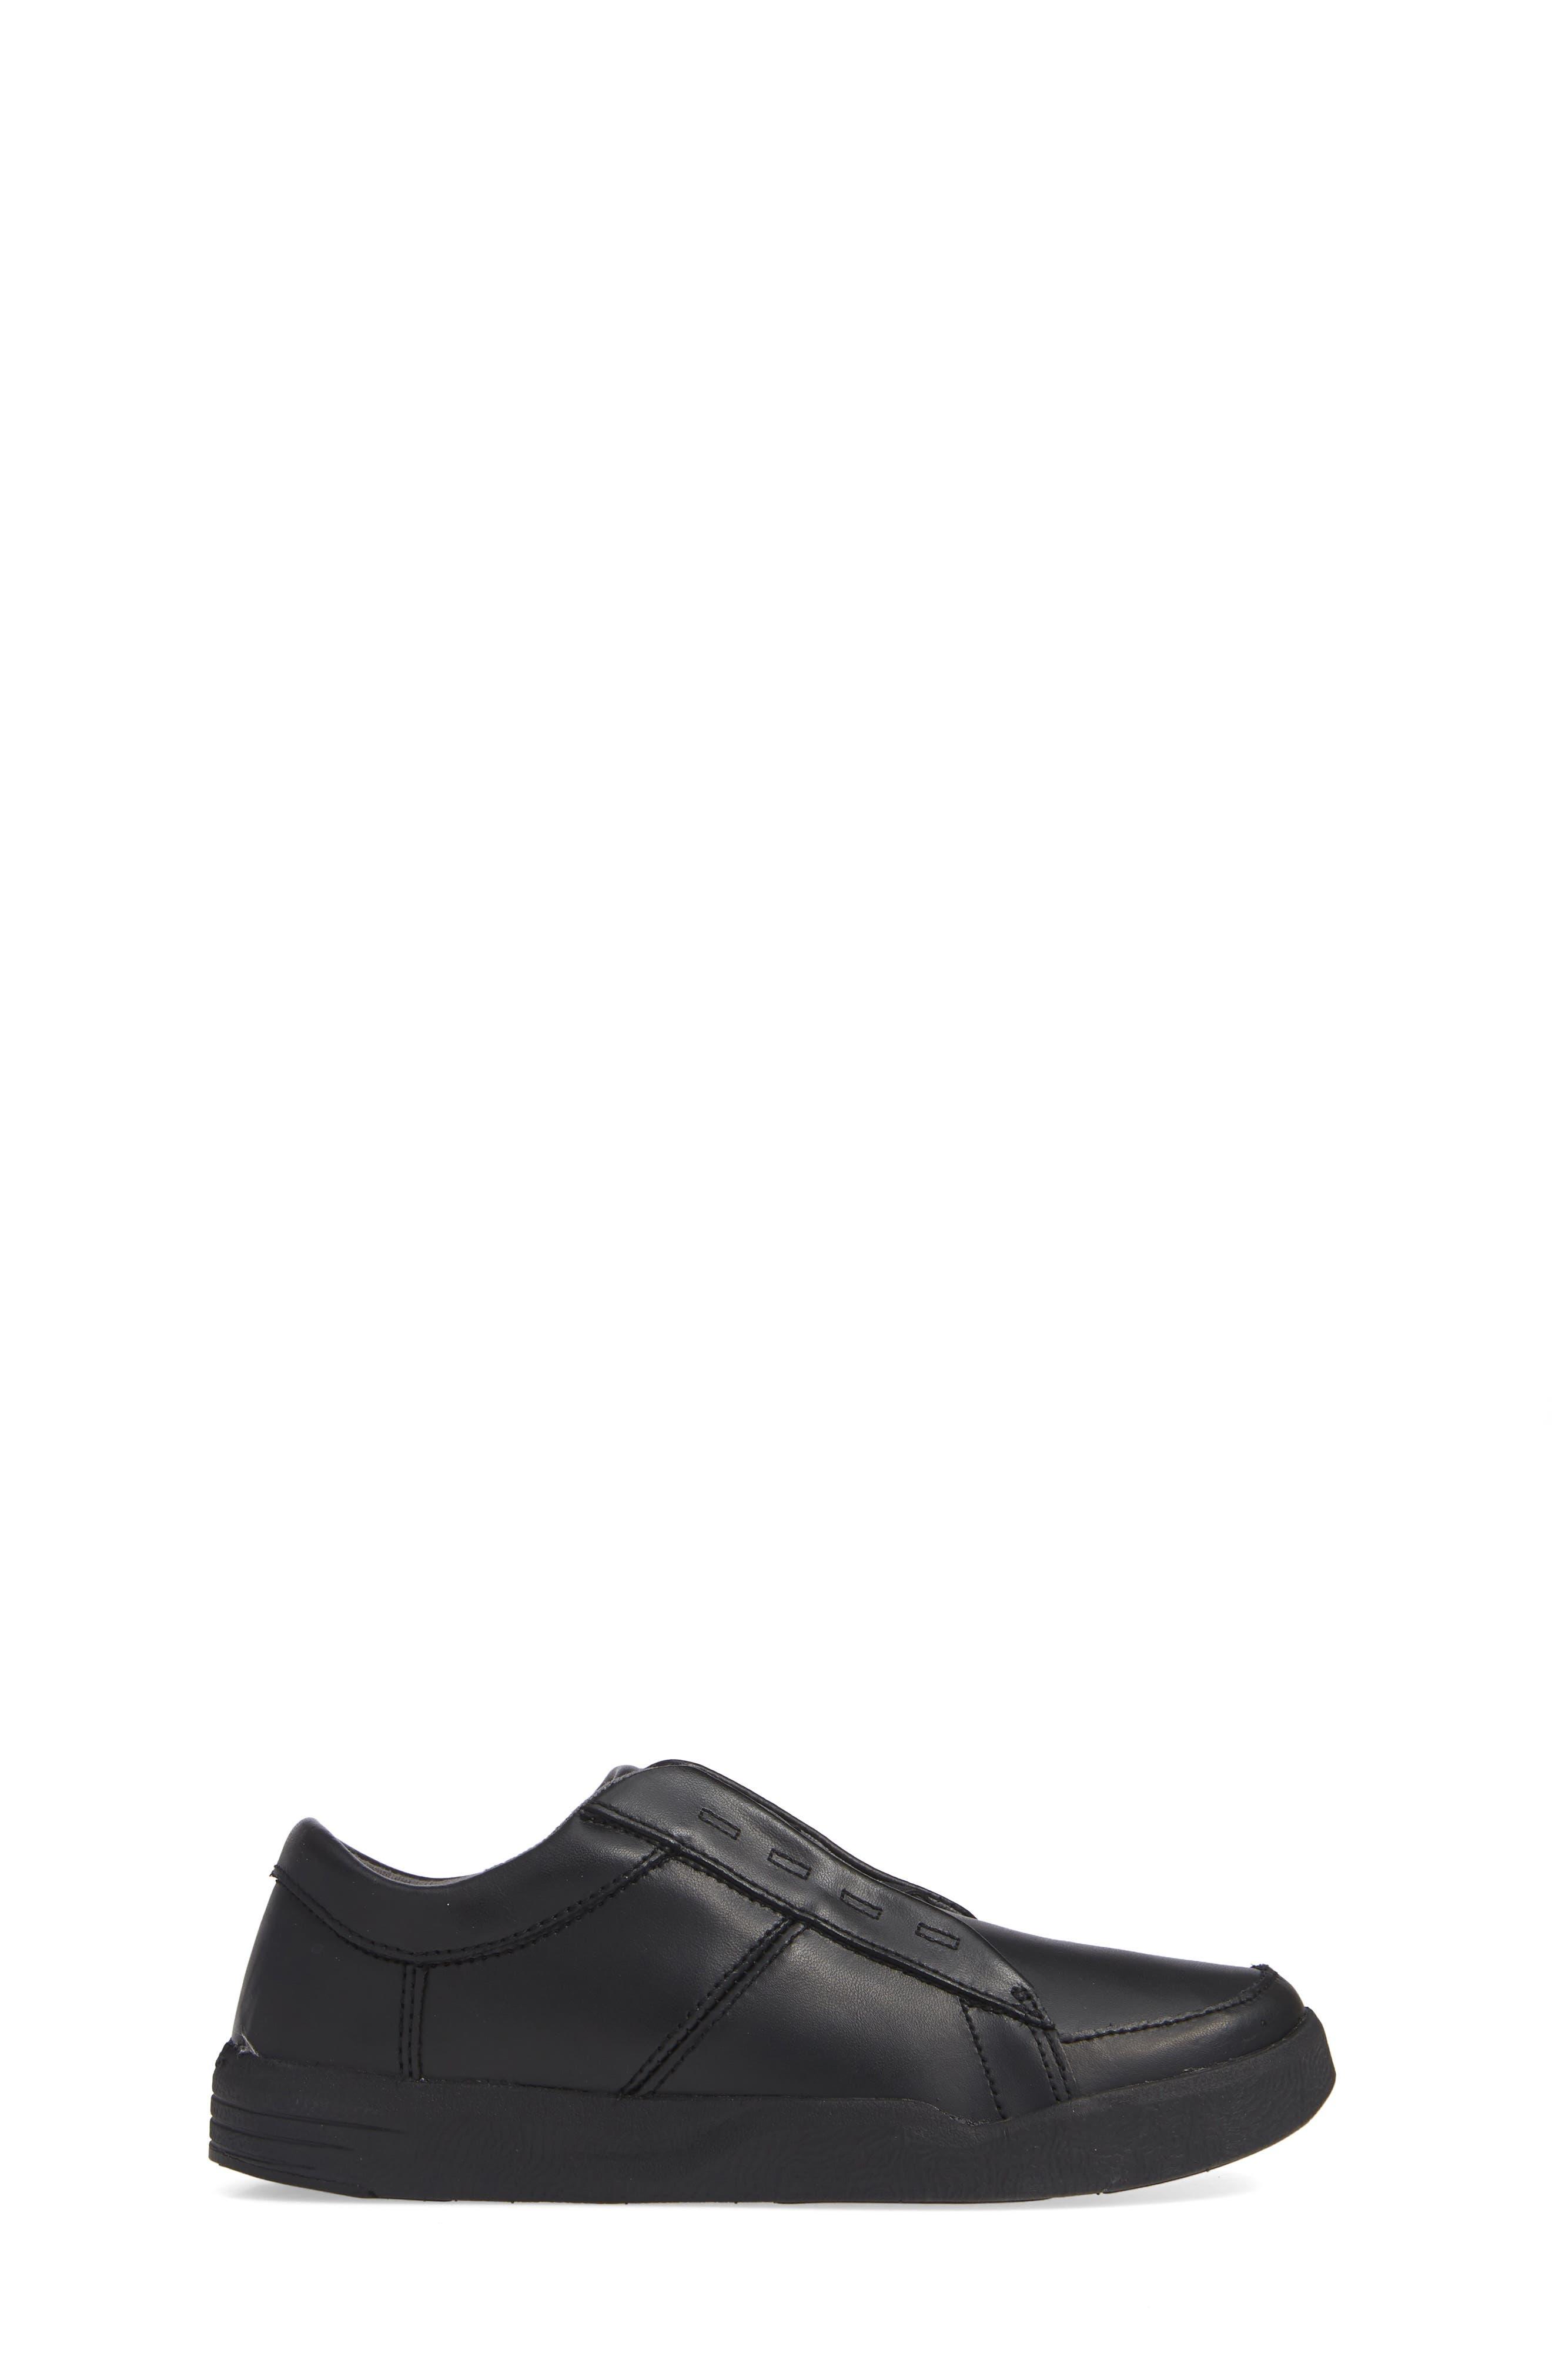 Layden Genius Leather Sneaker,                             Alternate thumbnail 3, color,                             BLACK/ BLACK